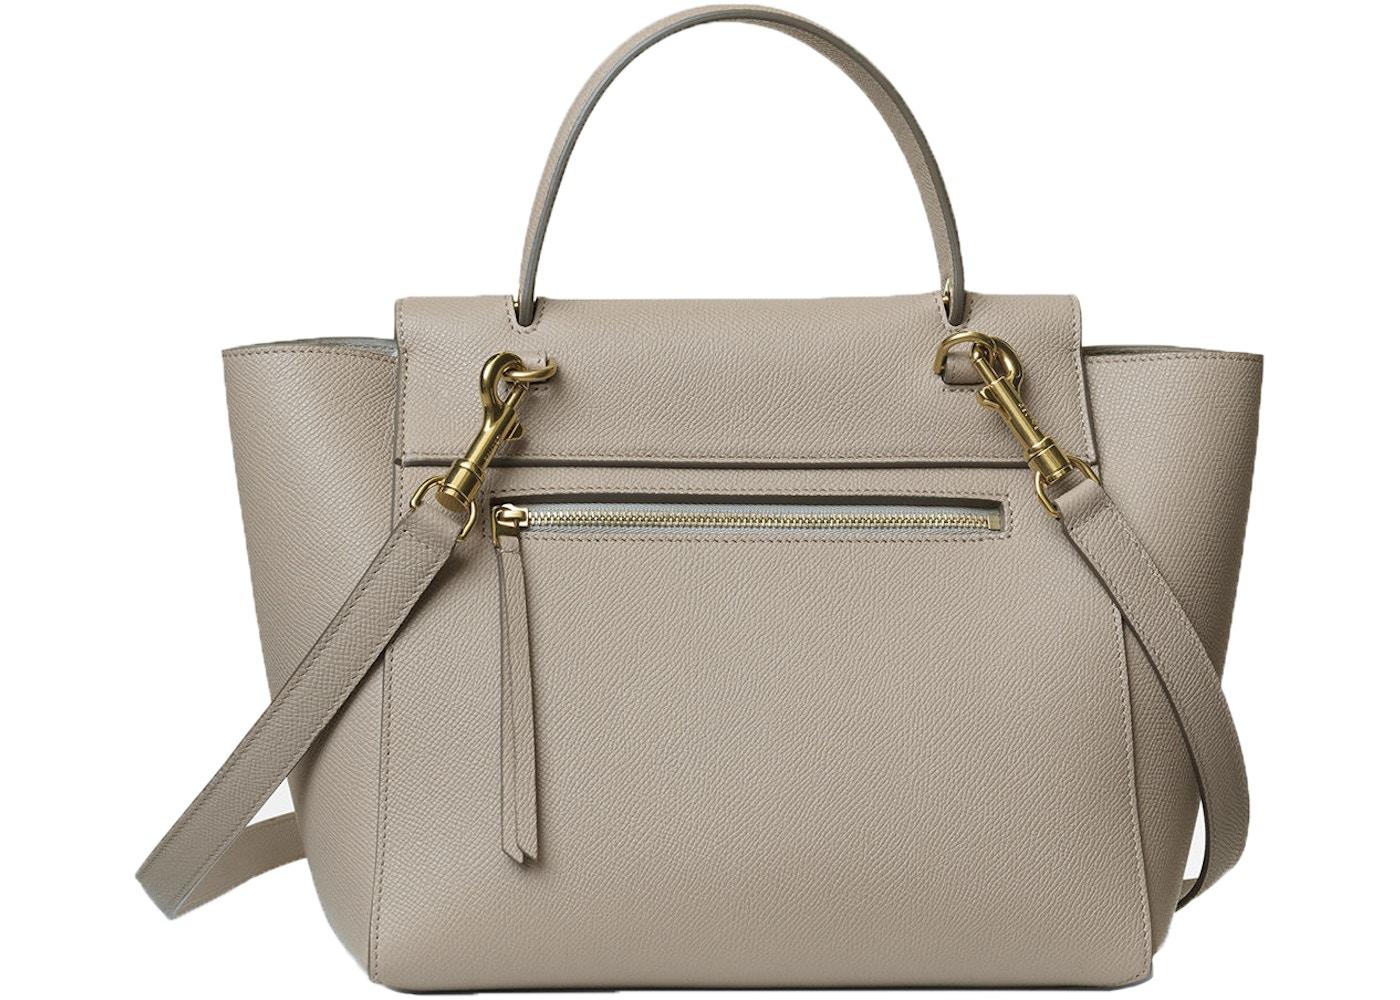 Celine Top Handle Belt Bag Grained Micro Light Taupe